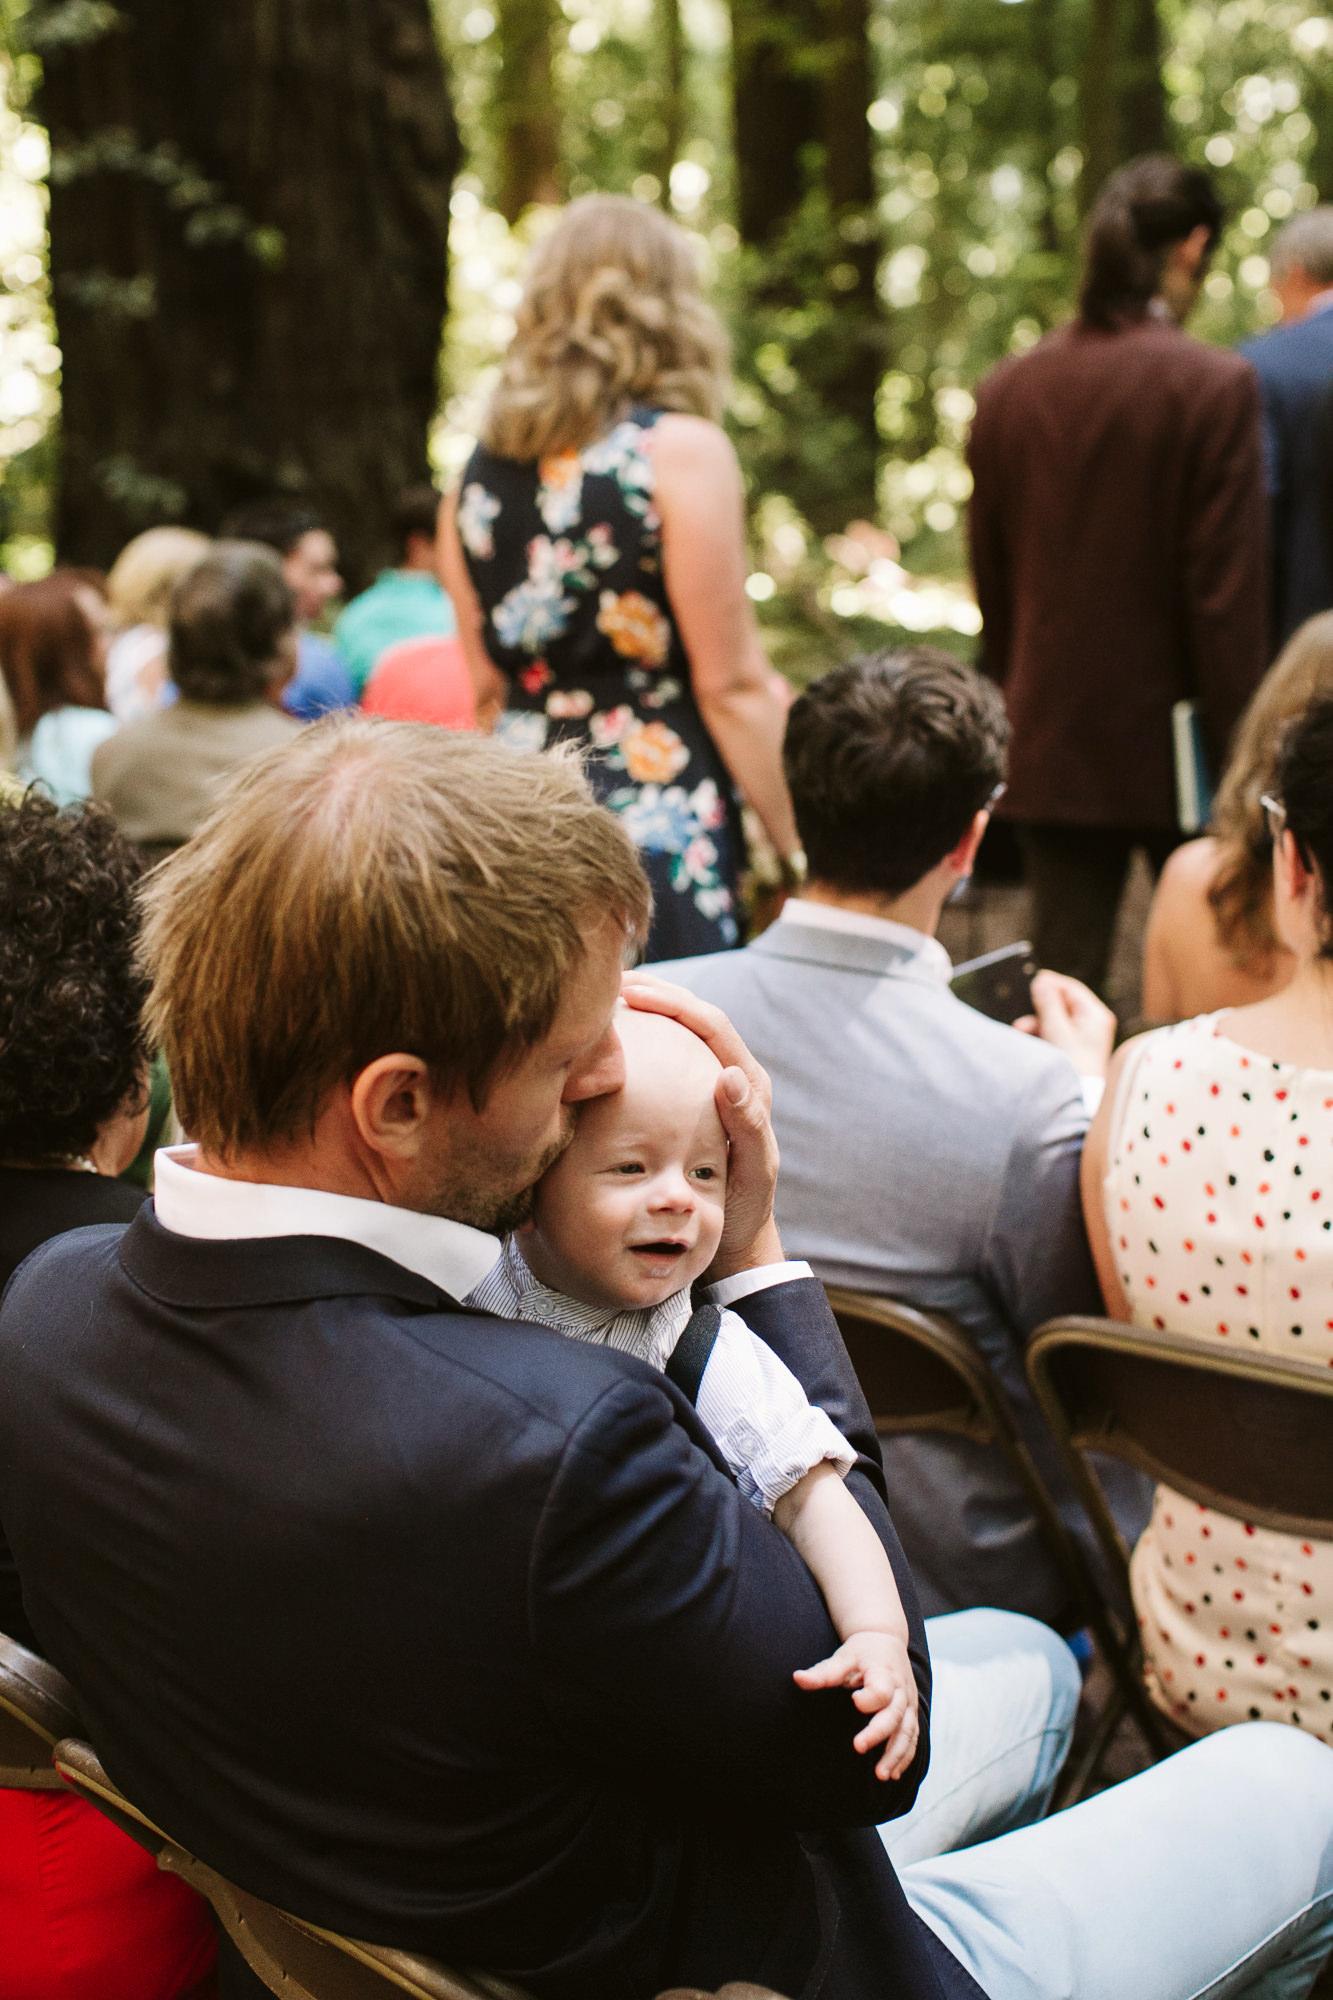 California-wedding-photographer-alfonso-flores-pamplin-groove-165.jpg